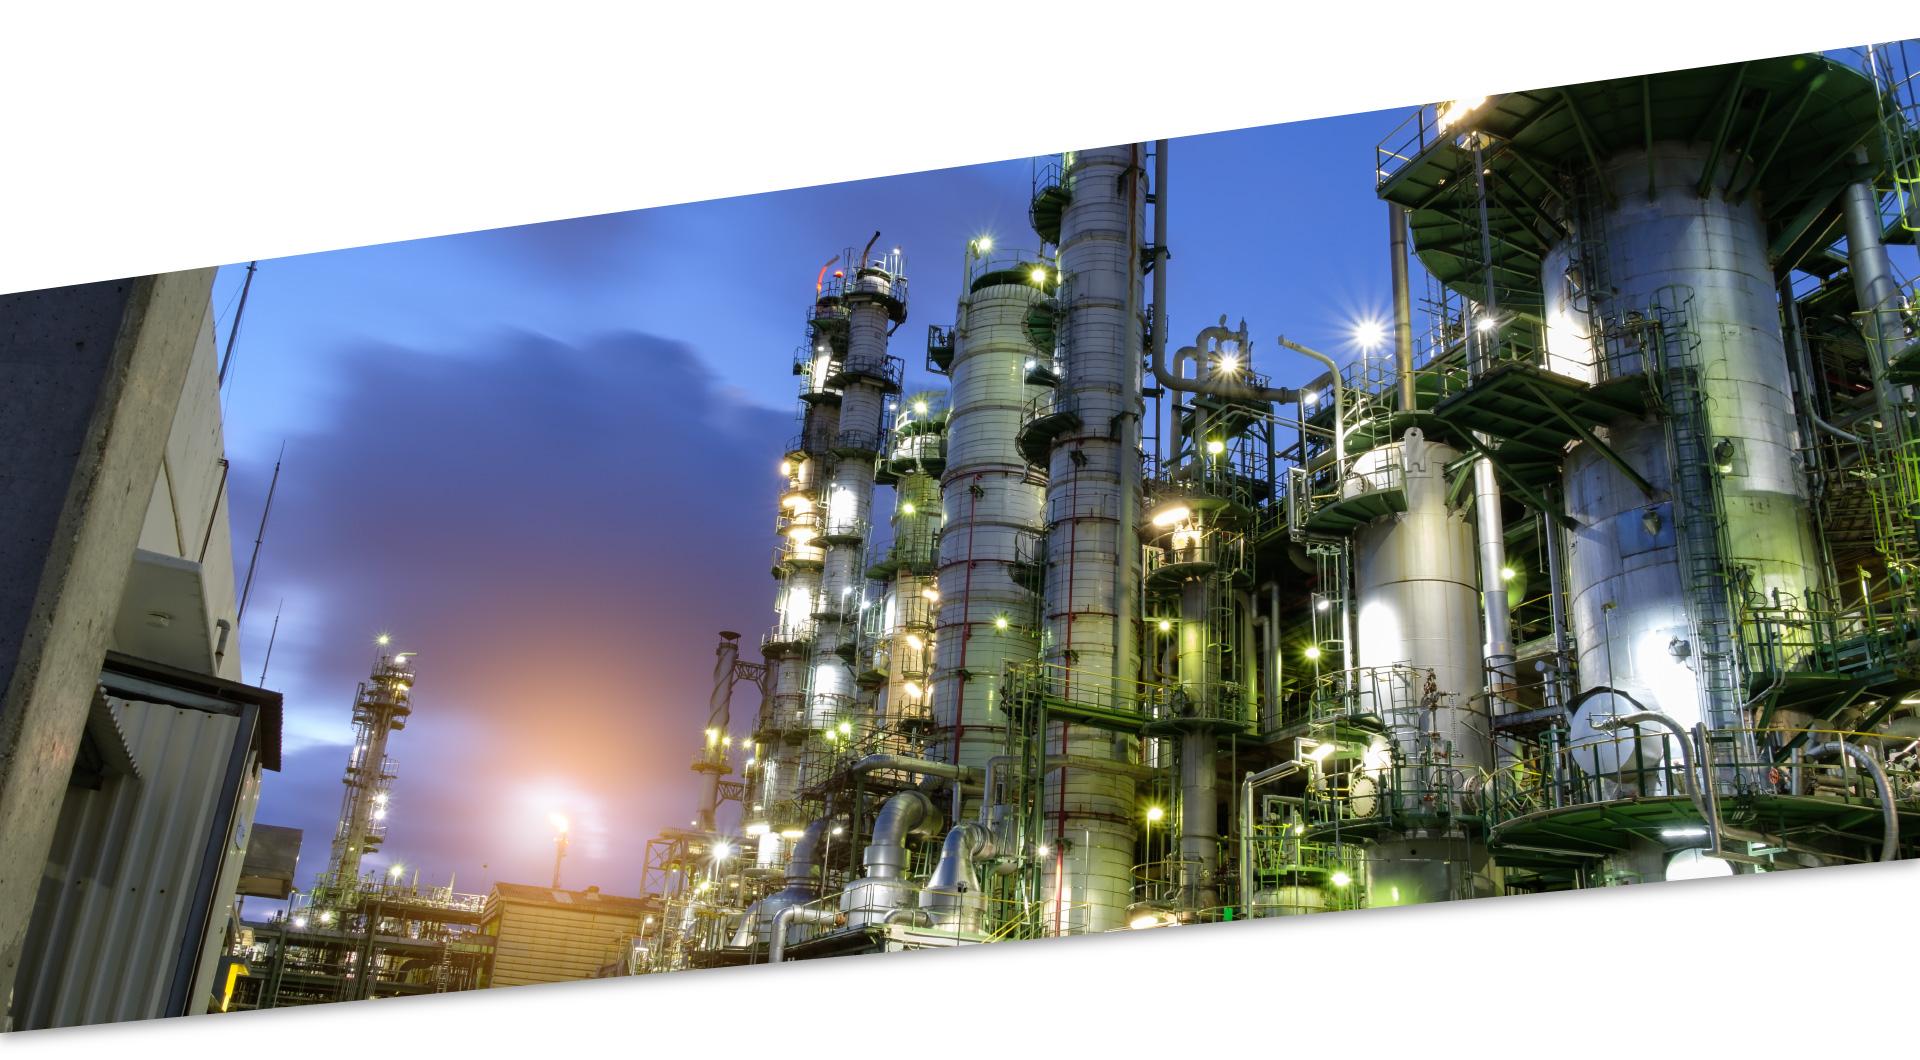 Rohstoffe & Energie